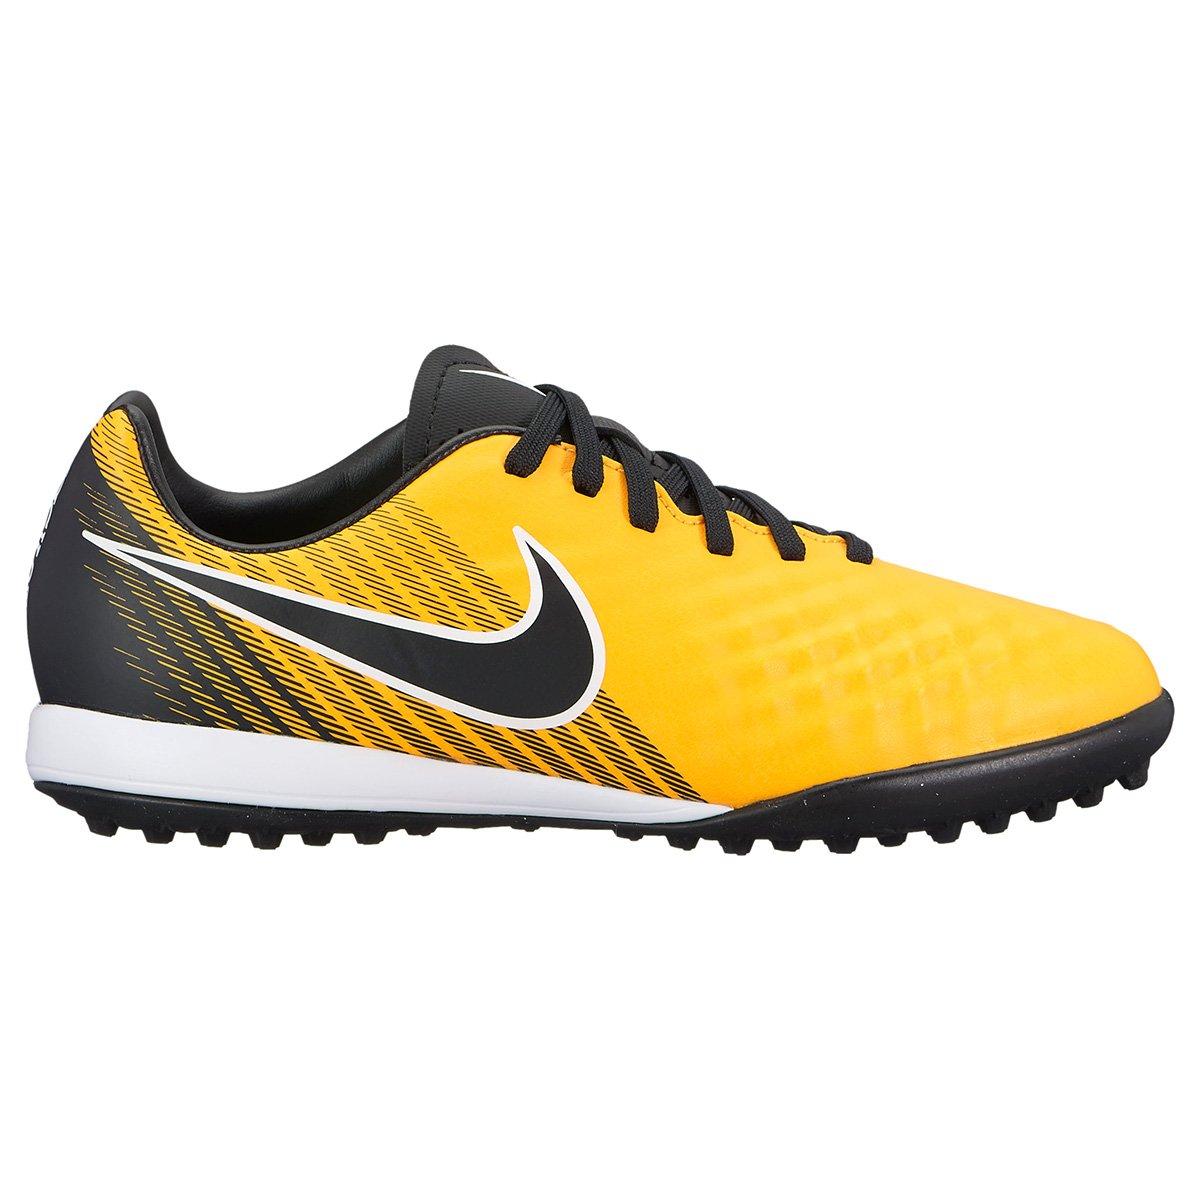 5ddc508890 Chuteira Society Infantil Nike Magista Onda 2 TF - Compre Agora ...